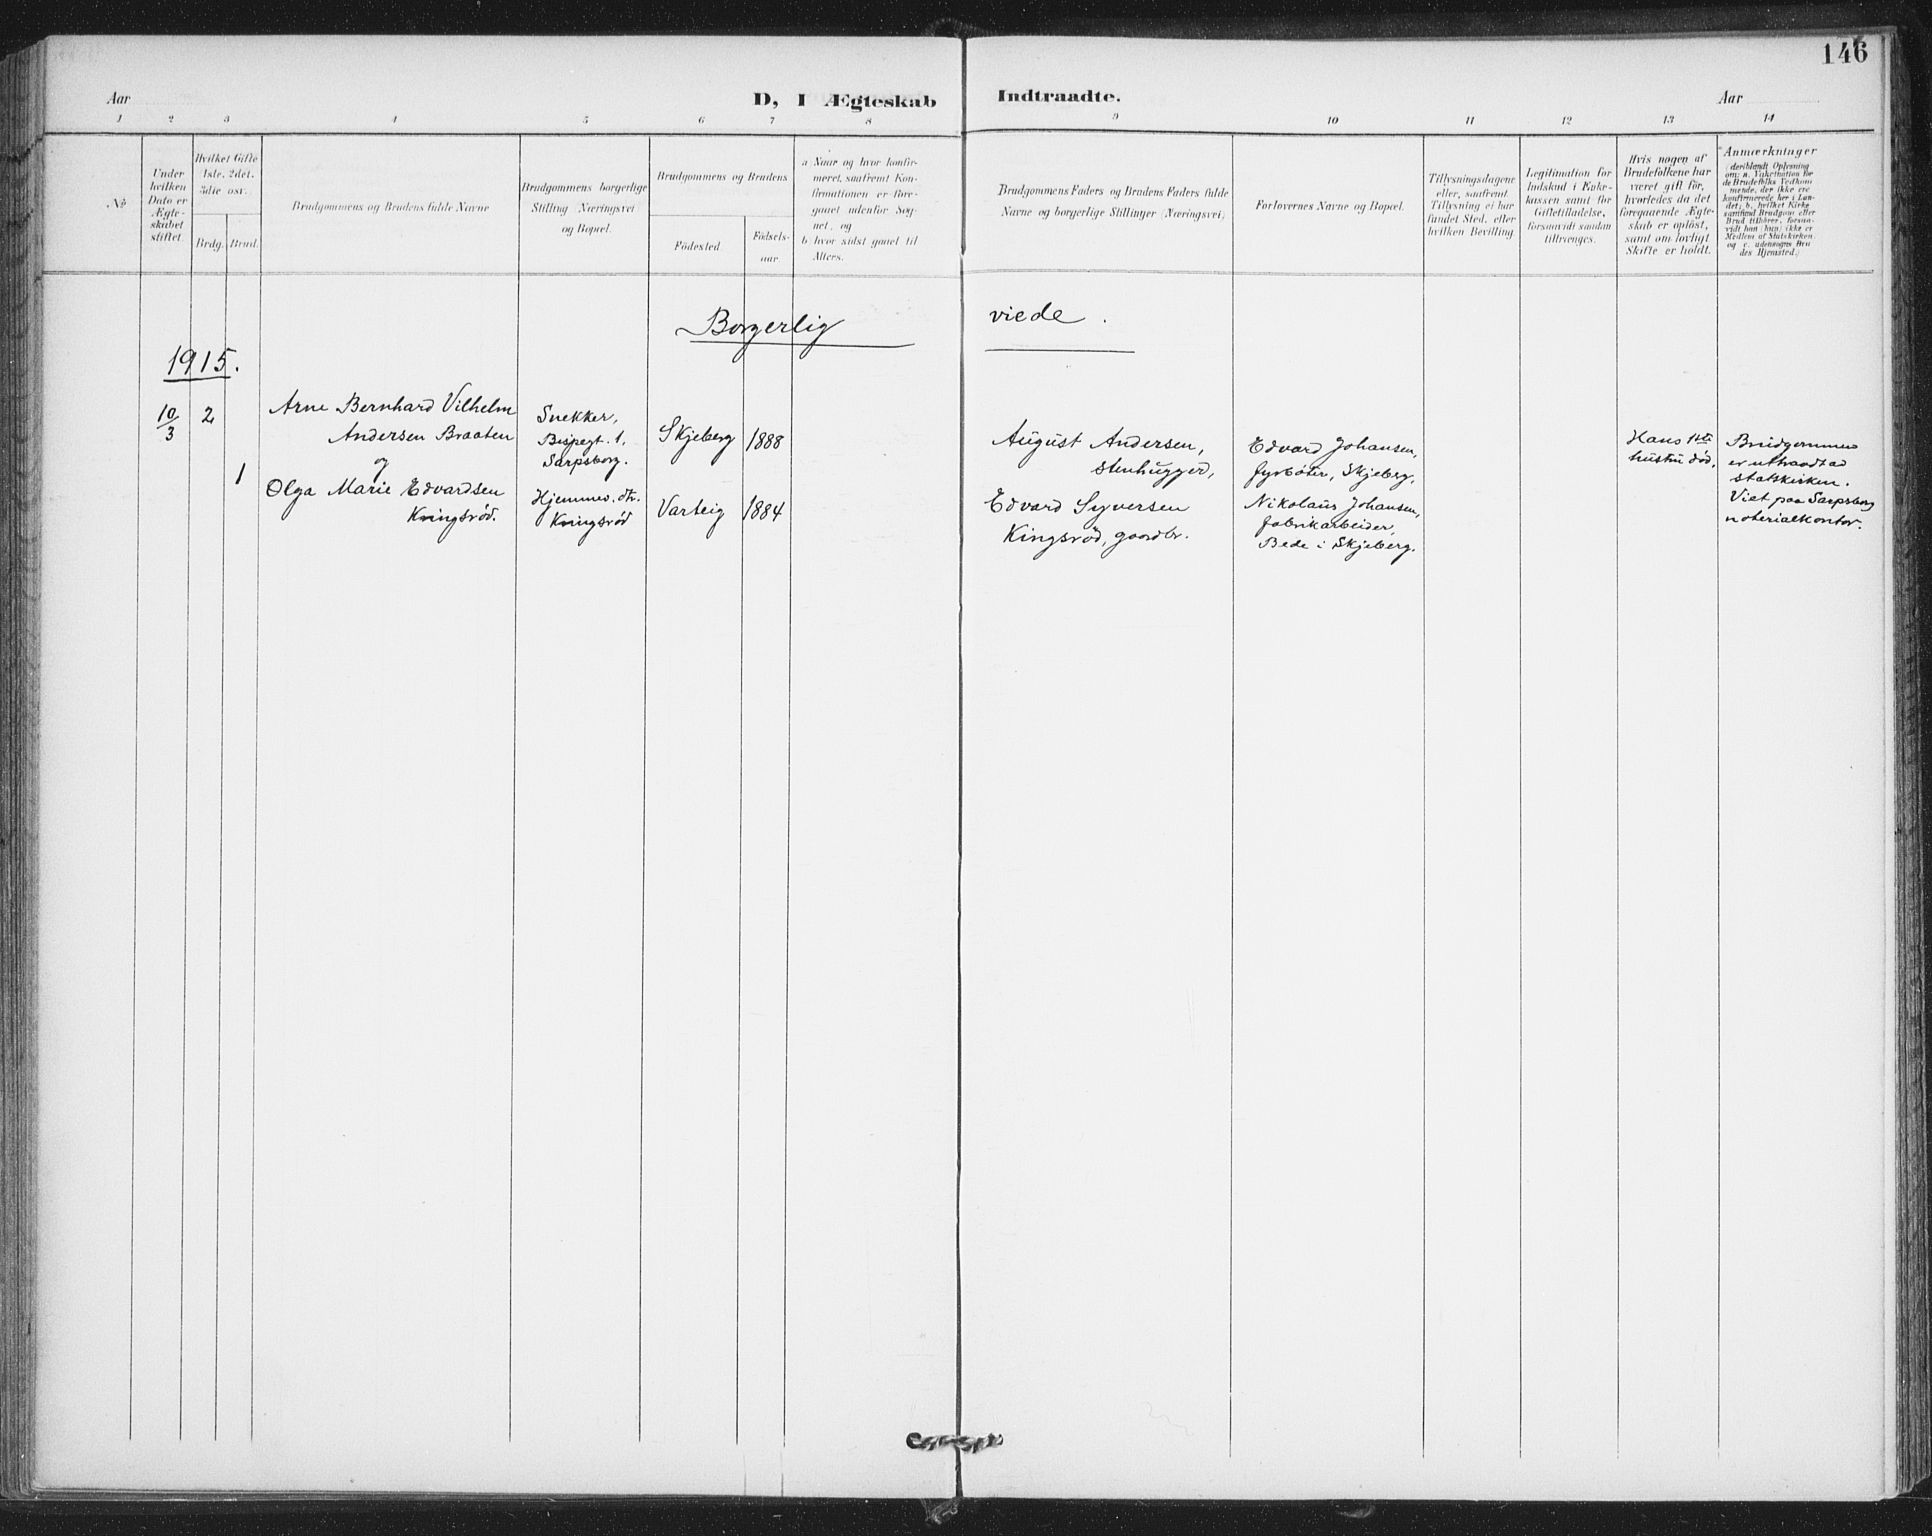 SAO, Varteig prestekontor Kirkebøker, F/Fa/L0003: Ministerialbok nr. 3, 1899-1919, s. 146